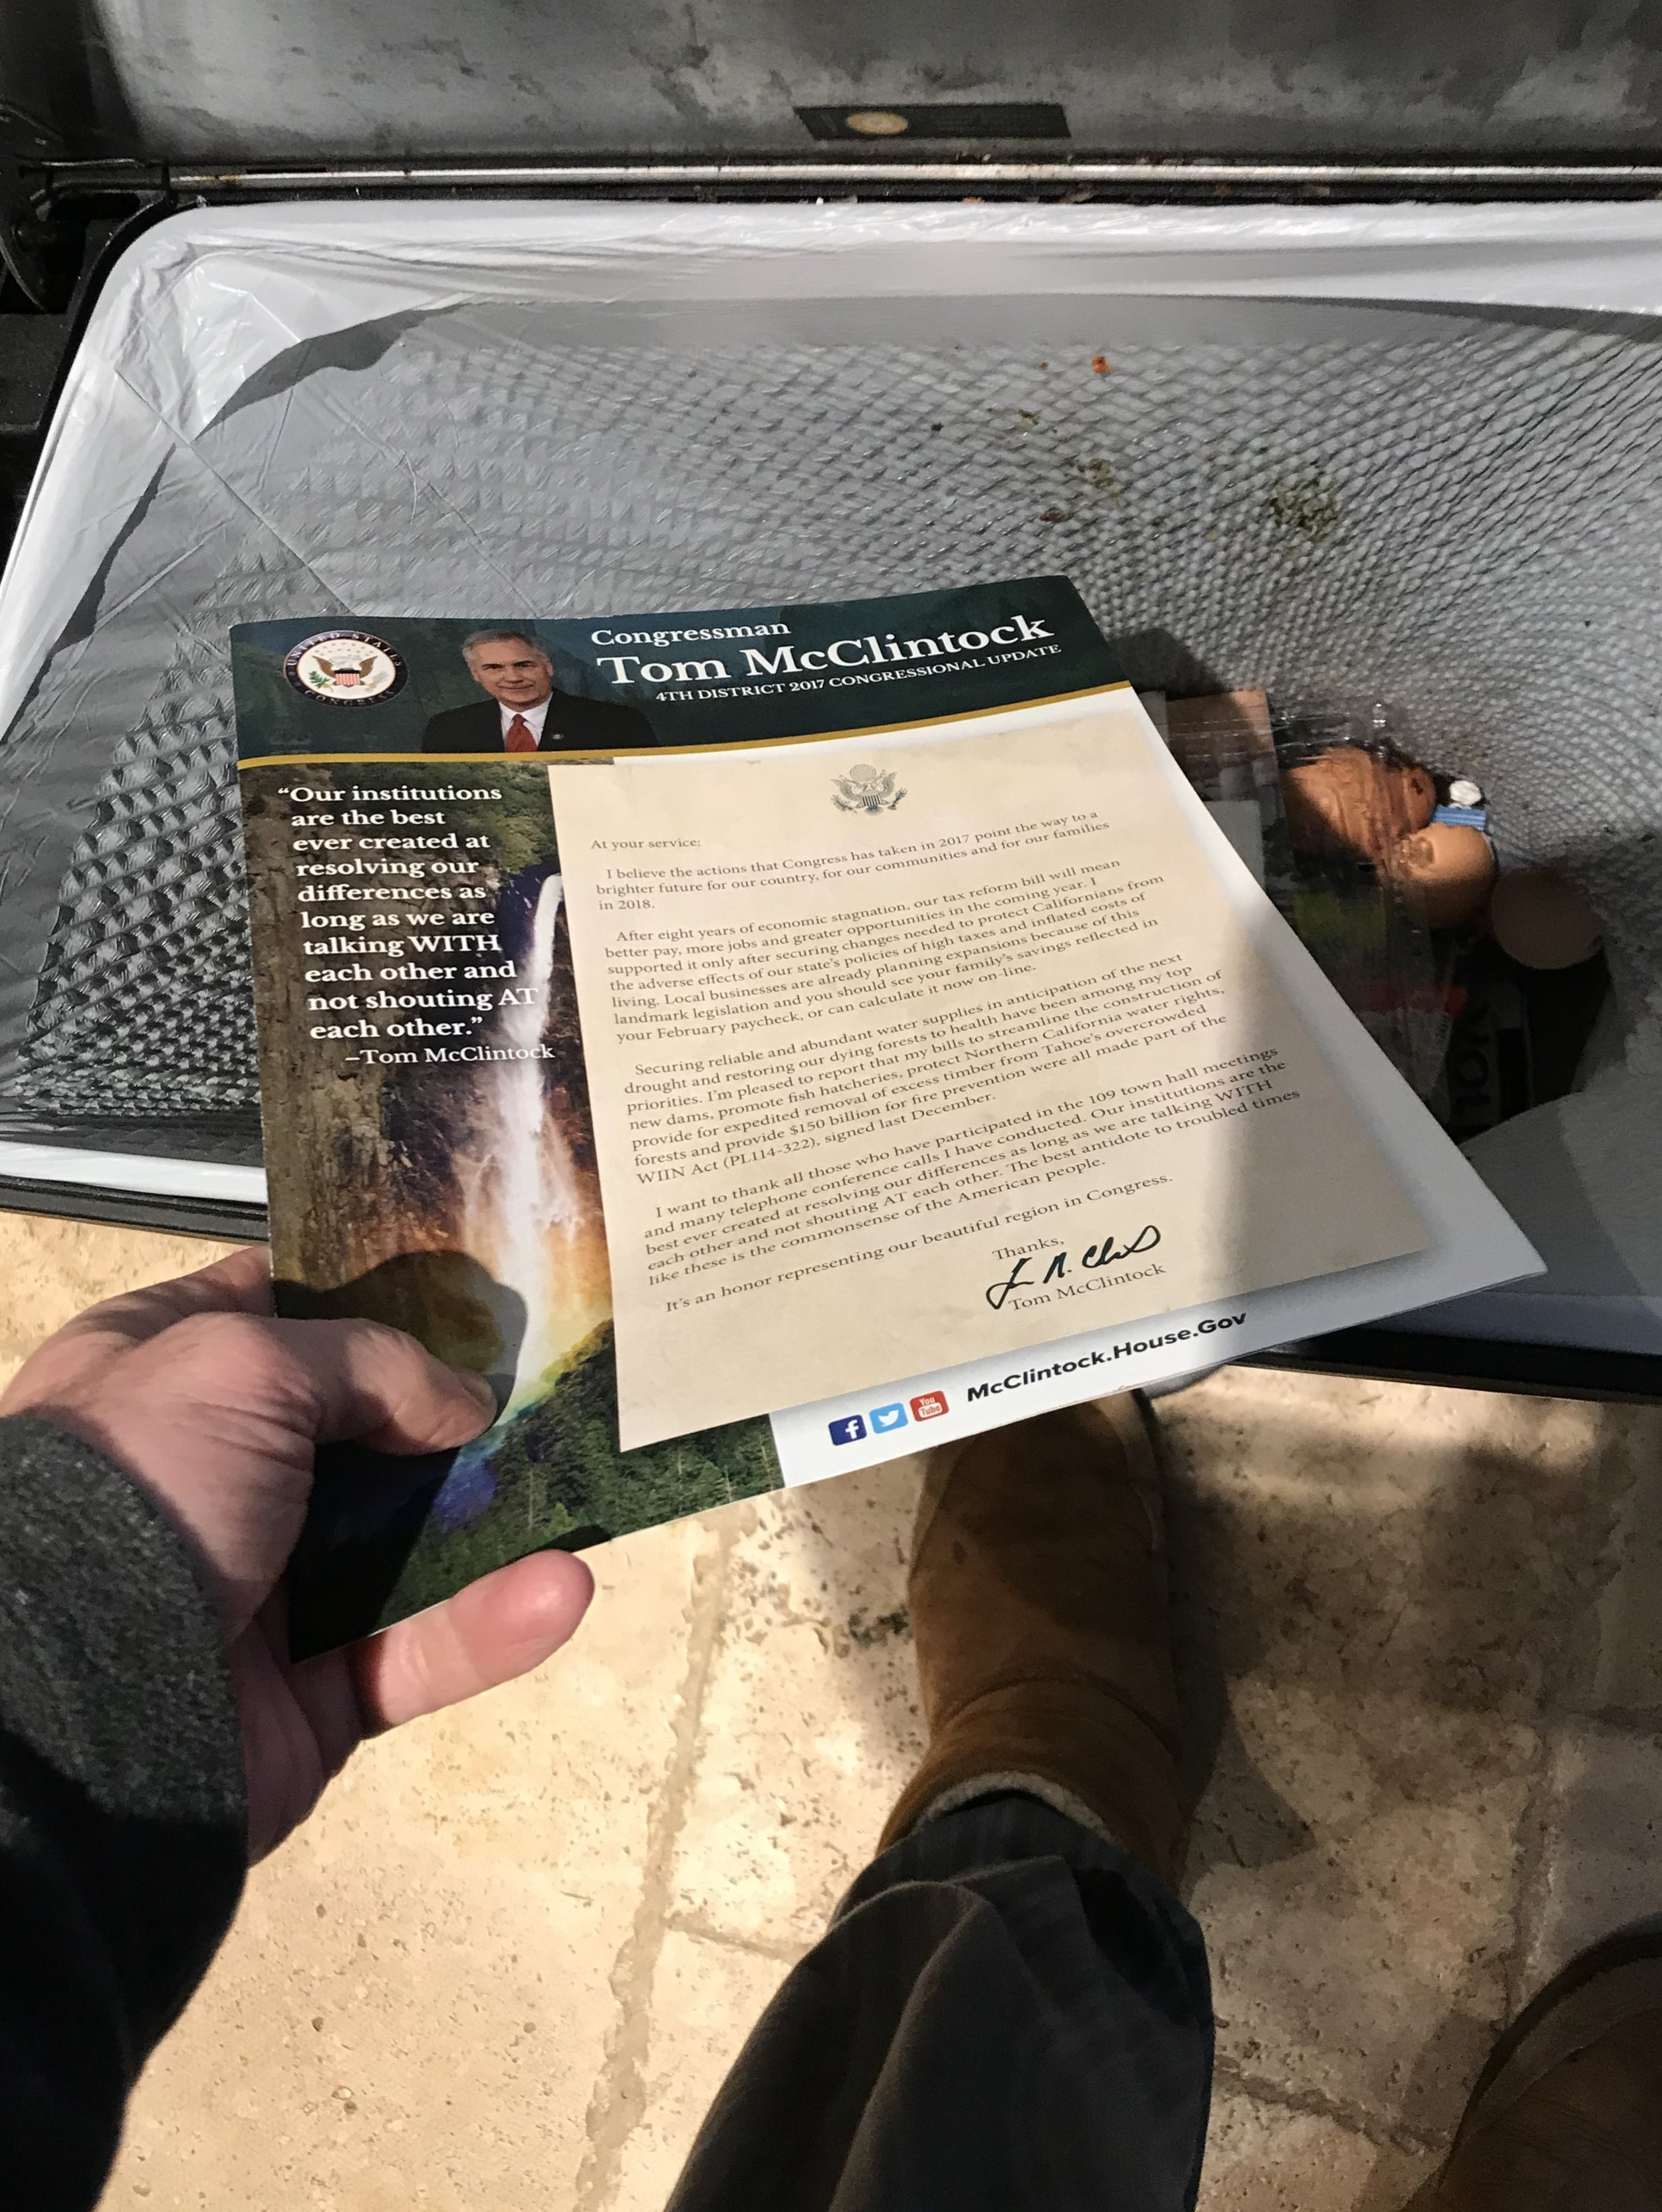 McClintock brochure in the trash can